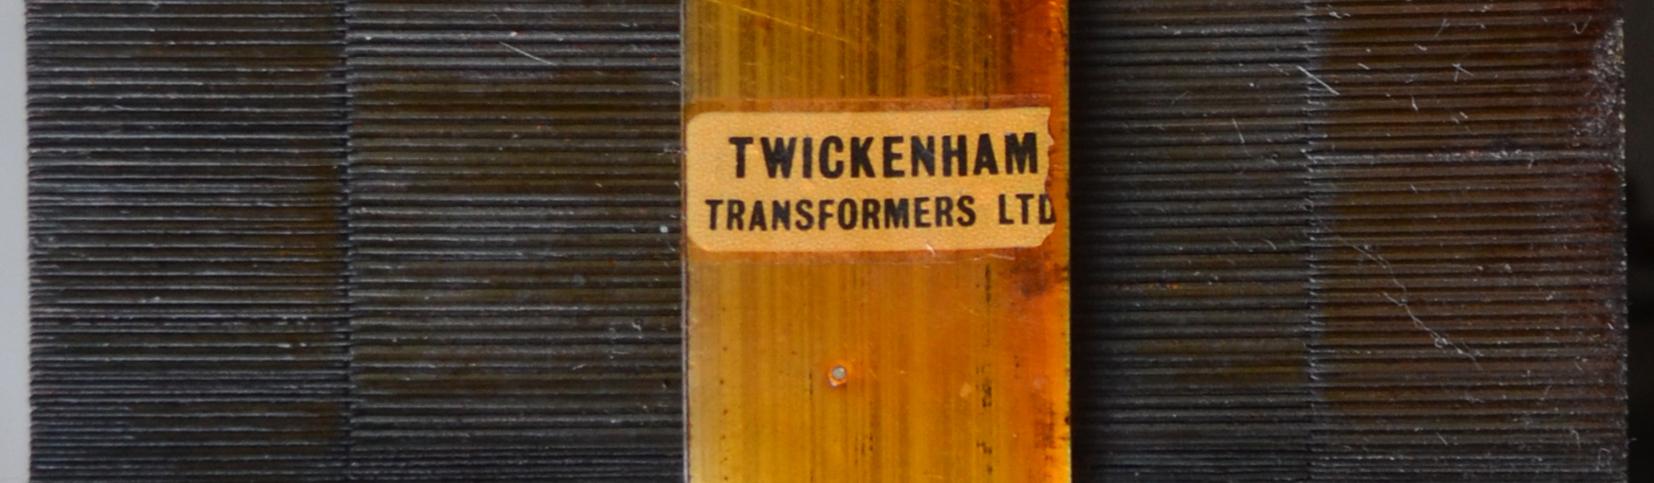 Vox Defiant, 1969, Twickenham Transformers (Stolec) power transformer